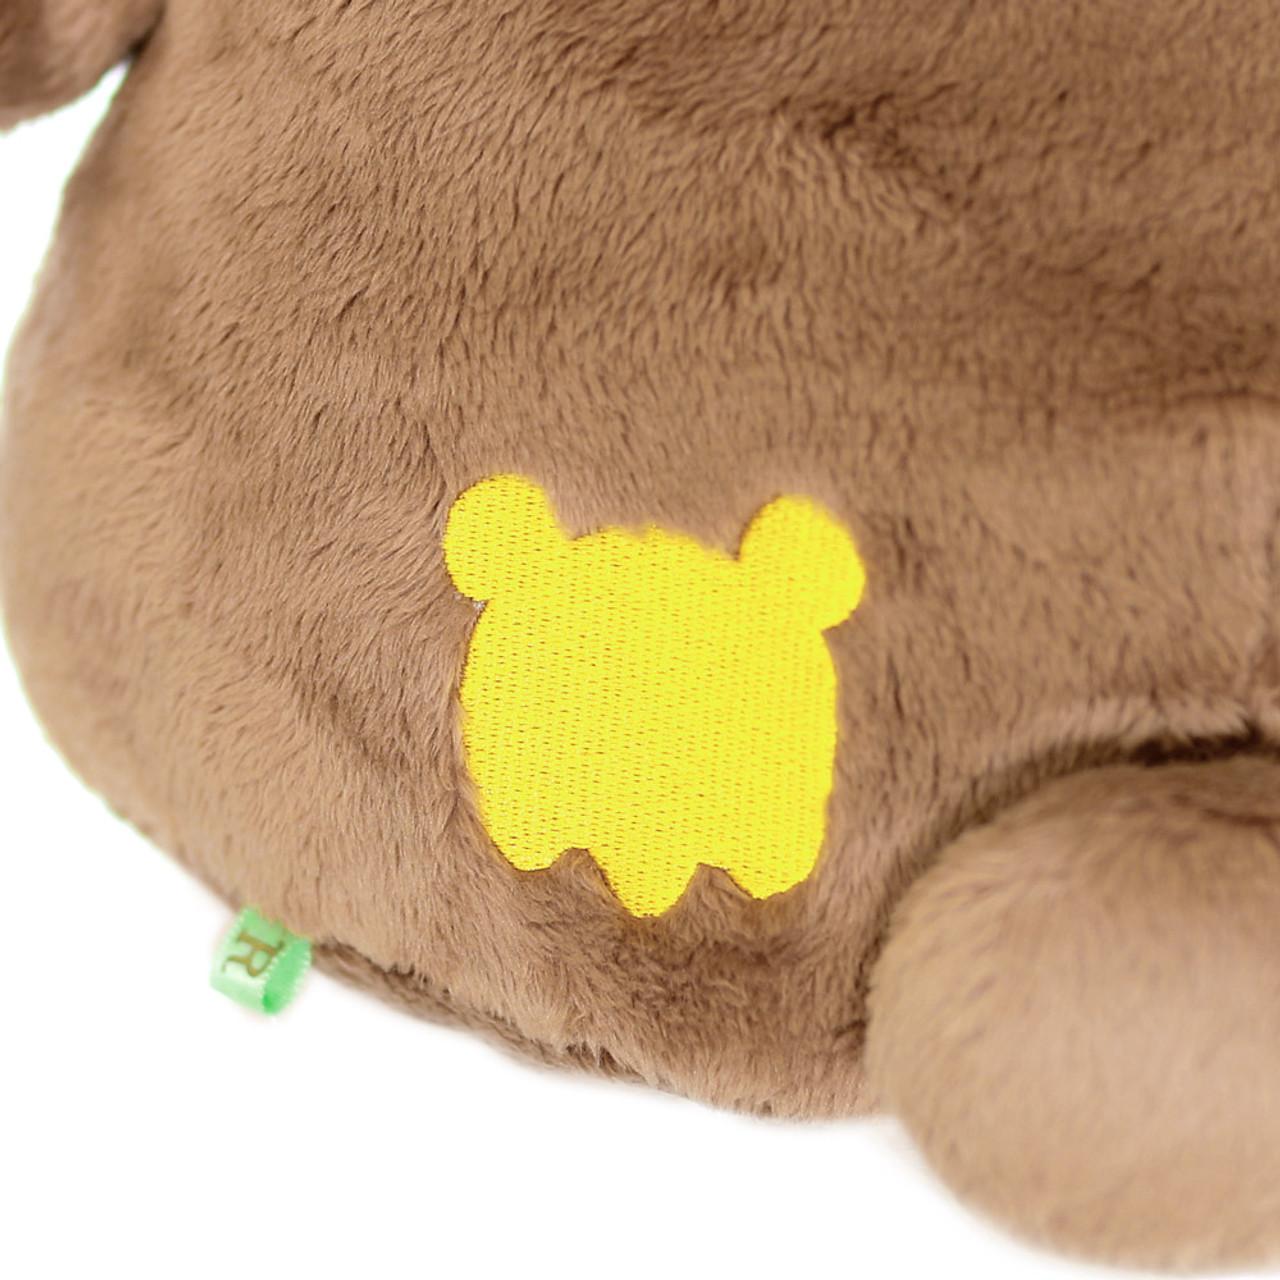 San-x Cute Sweet Chairoikoguma Bear Stuffed Animal Toy L MR94401 ( Butt View )